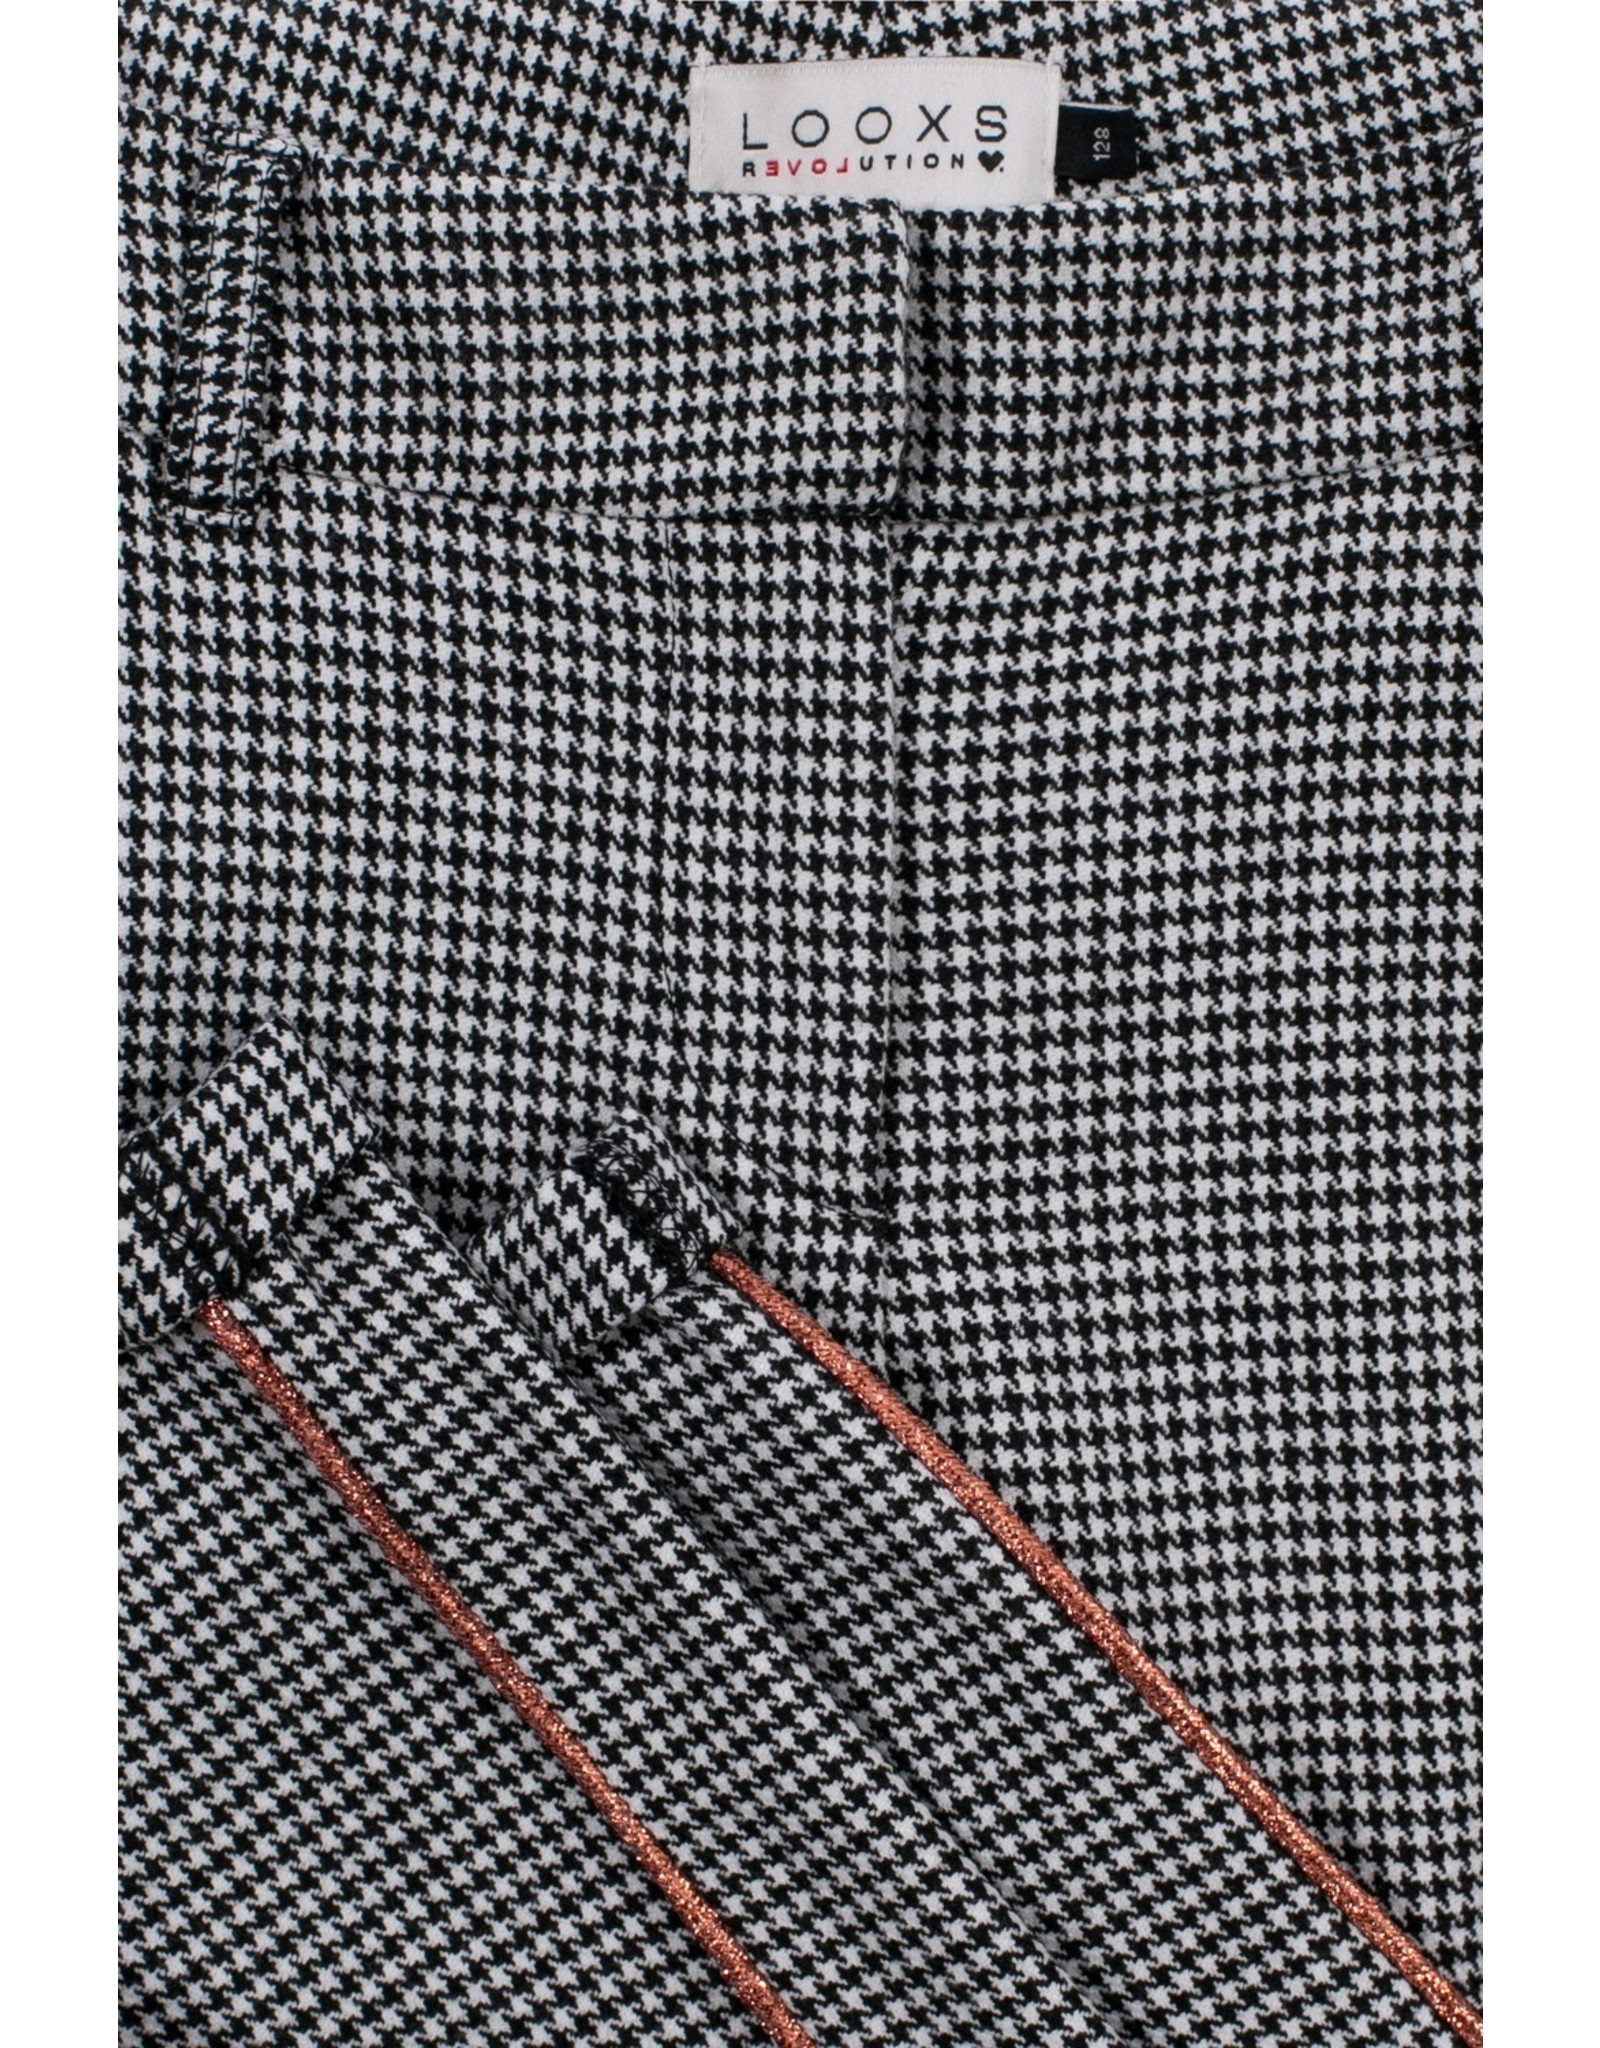 LOOXS 10sixteen Girls pants mini Pied de poule